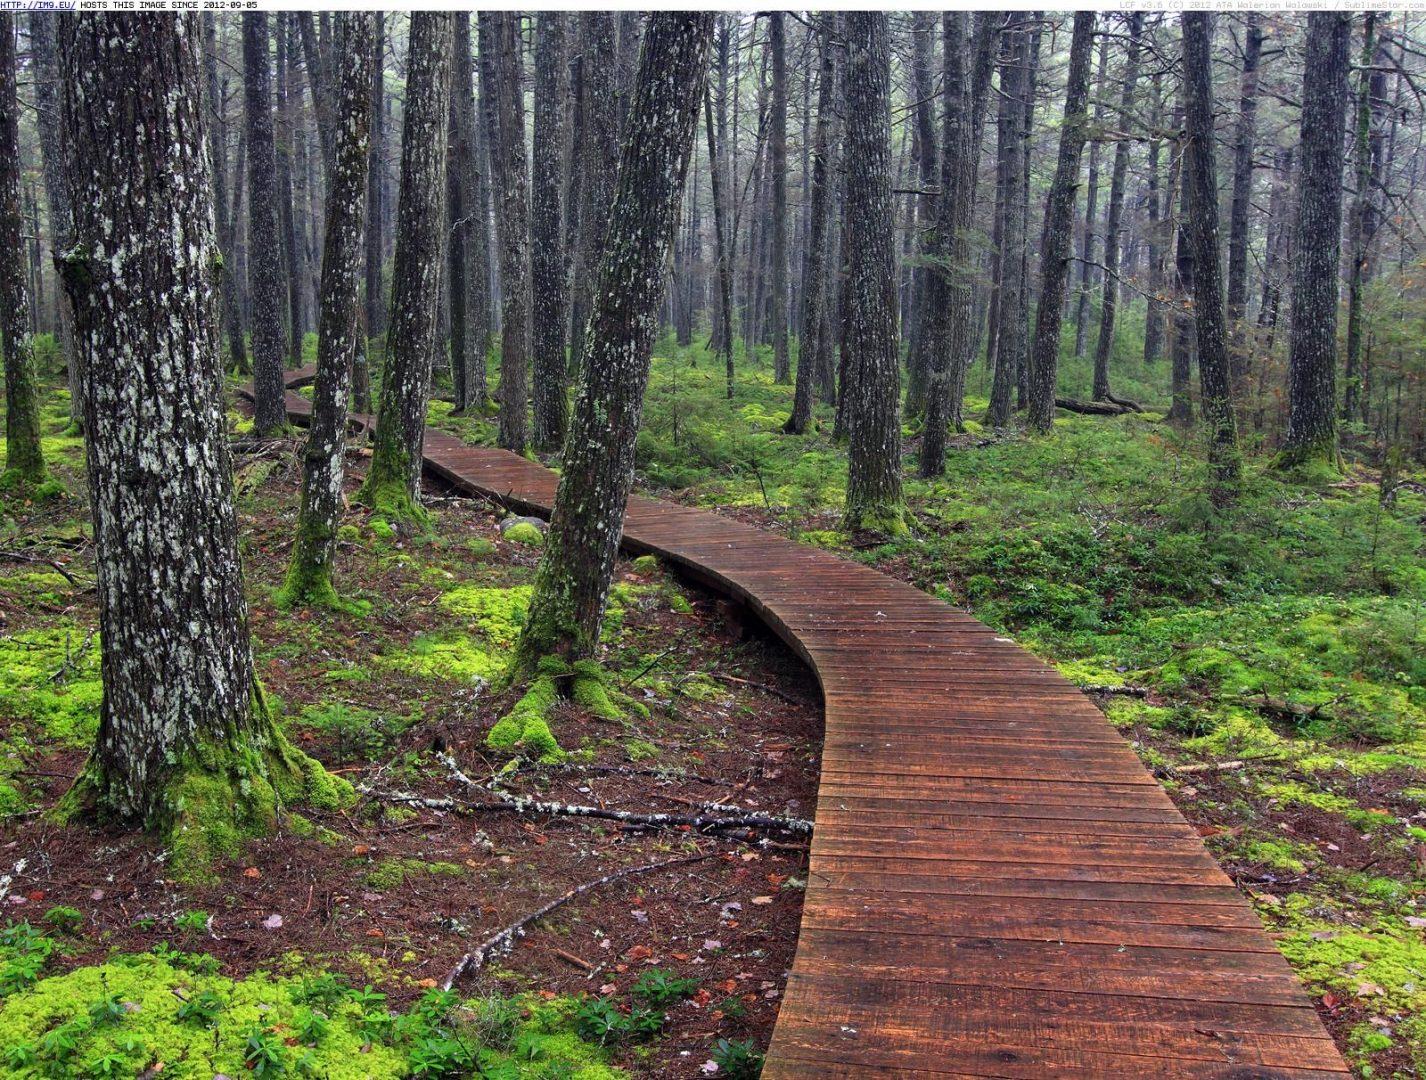 Kejimkujik National Park and National Historic Site, Nova Scotia, Canada